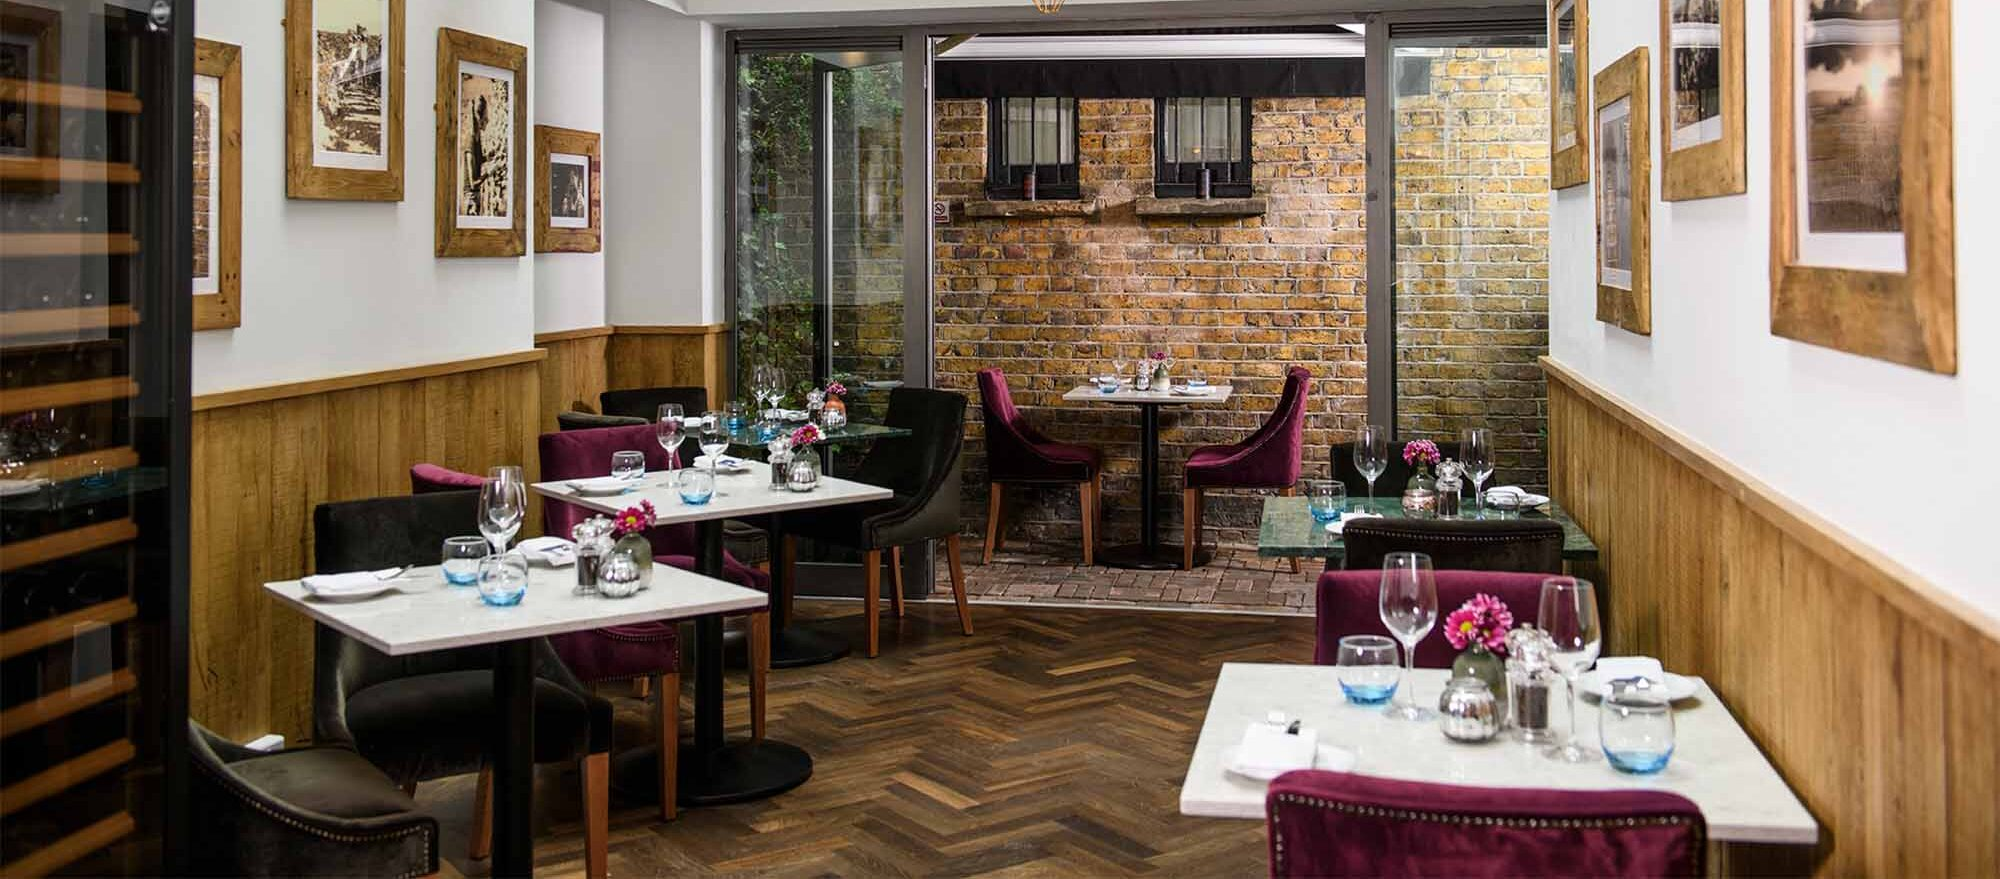 2850 South Kensington date spot